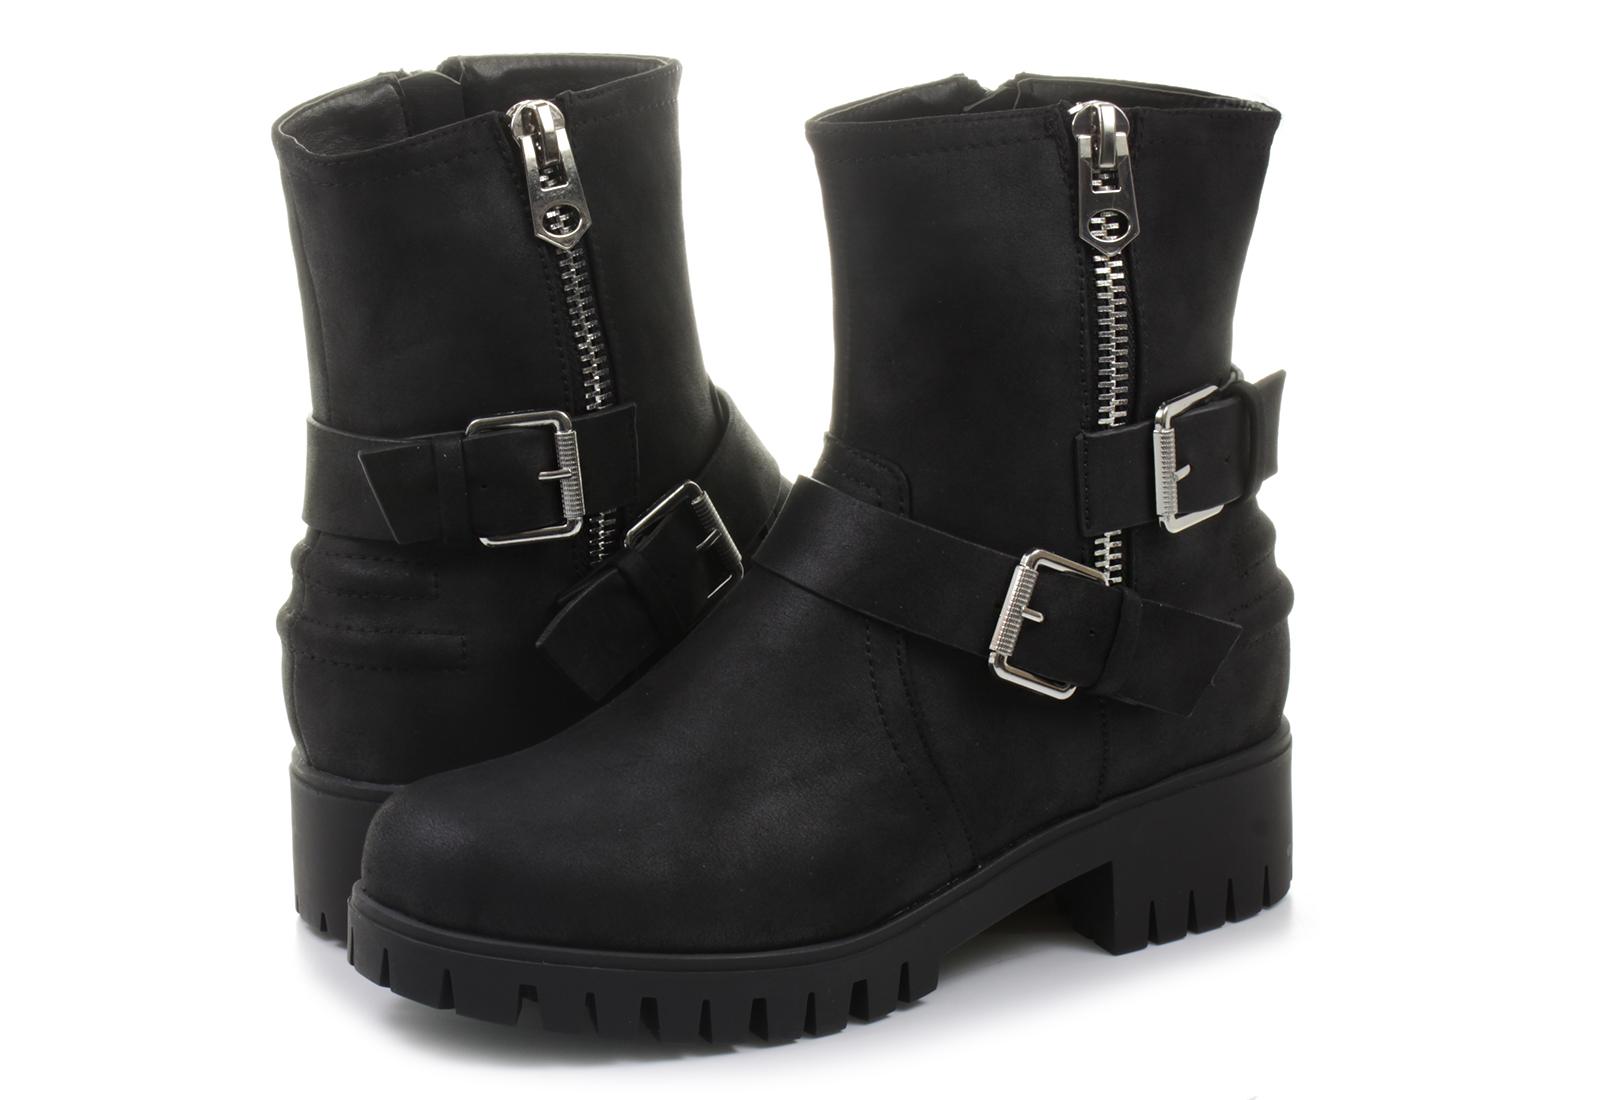 fef584a14e Blink Casual Crna Čizme - Blink - Office Shoes - Online prodavnica obuće